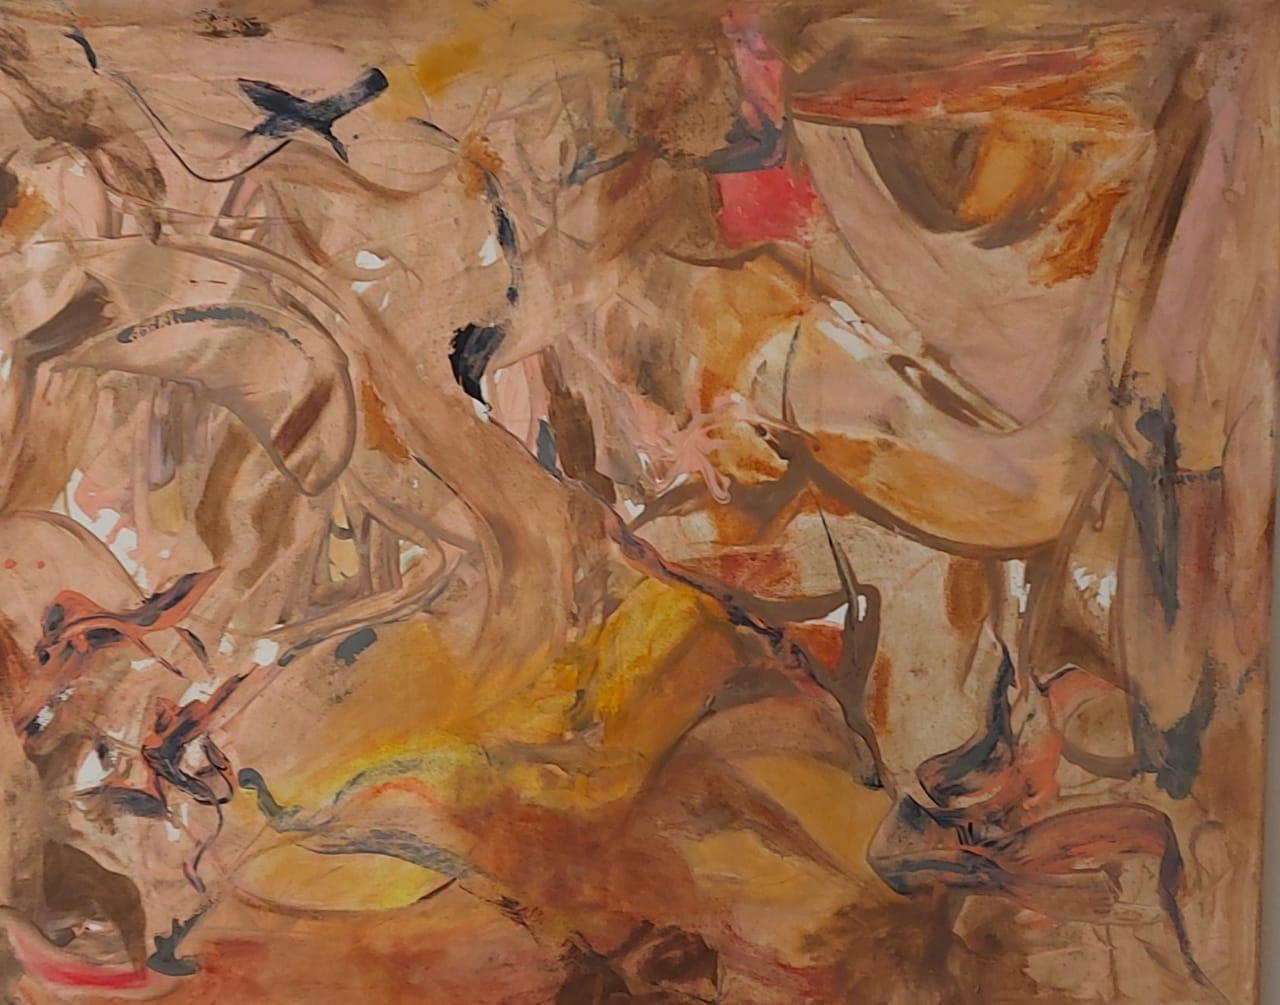 Kunst 2- Pintura sobre tela- 80 x 100 cm.- 2020.